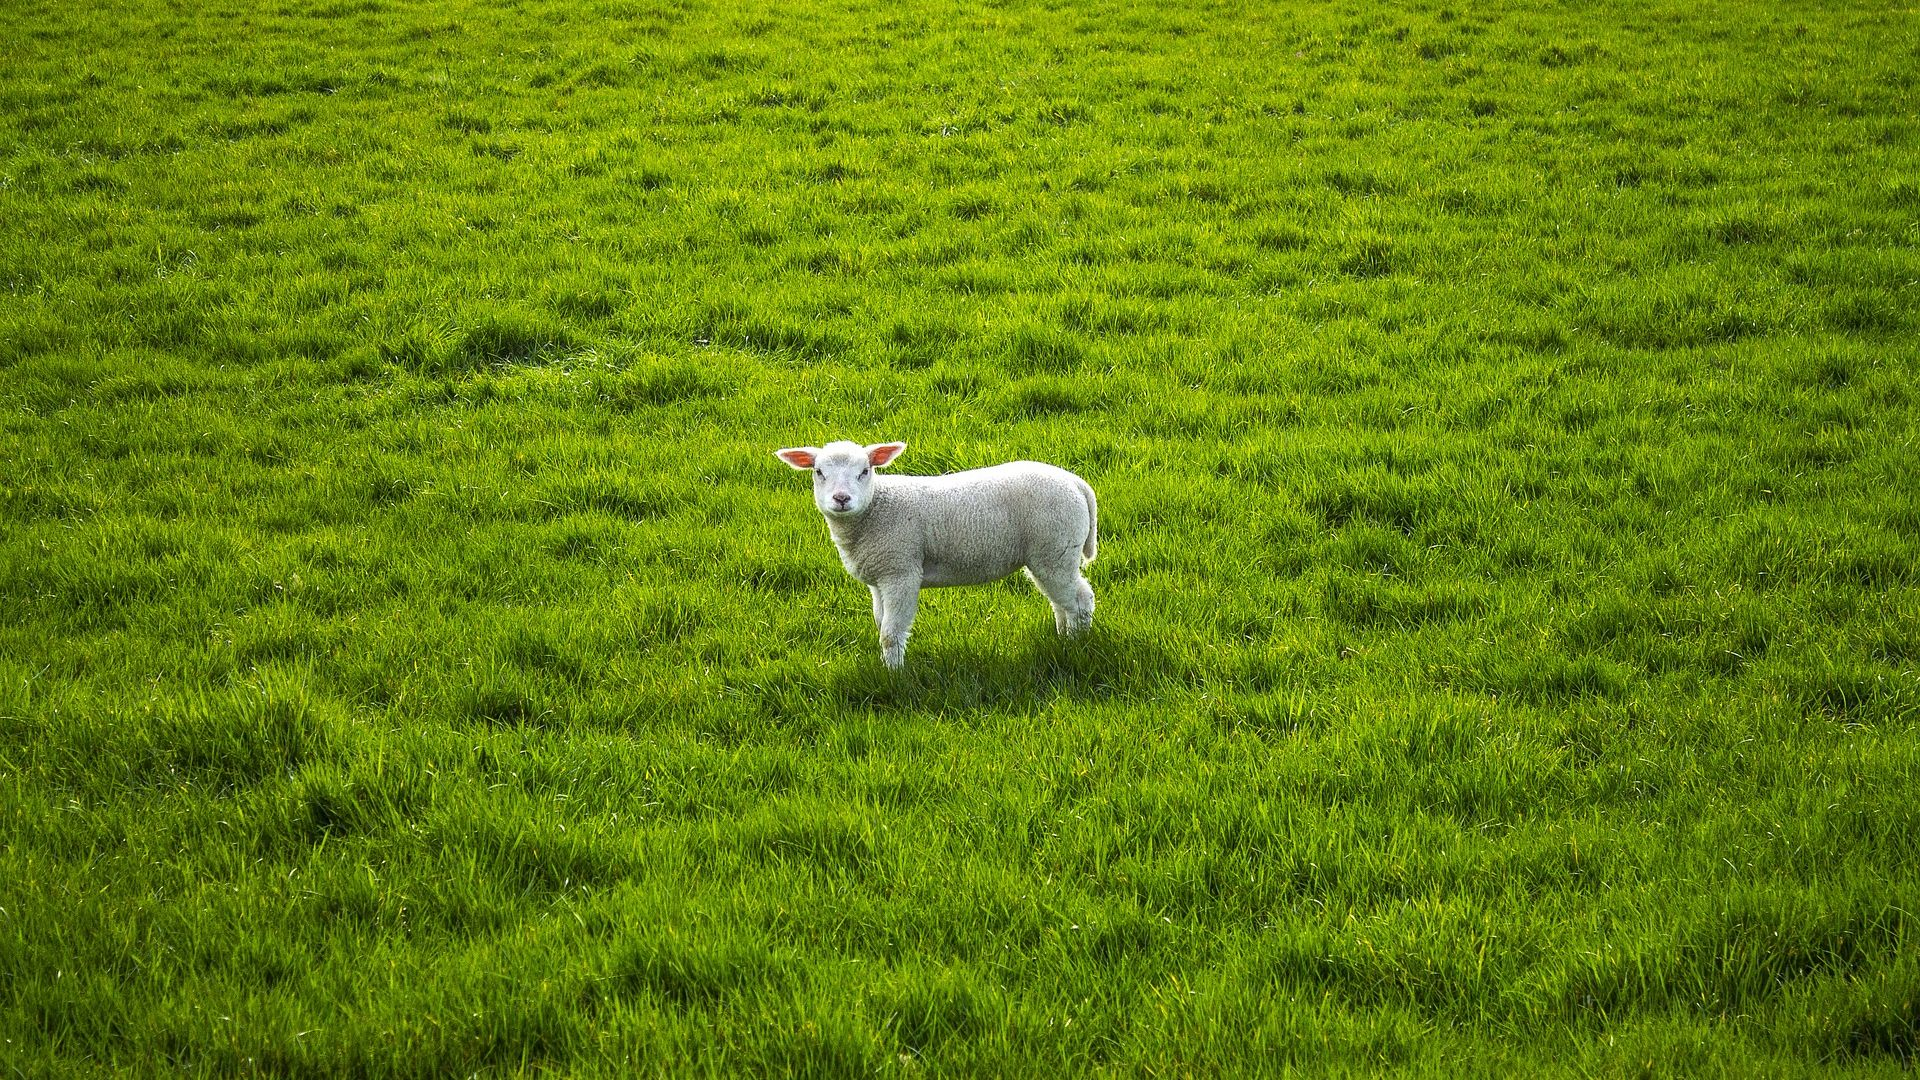 Sheep Lamb Cute Grass Field Wallpaper